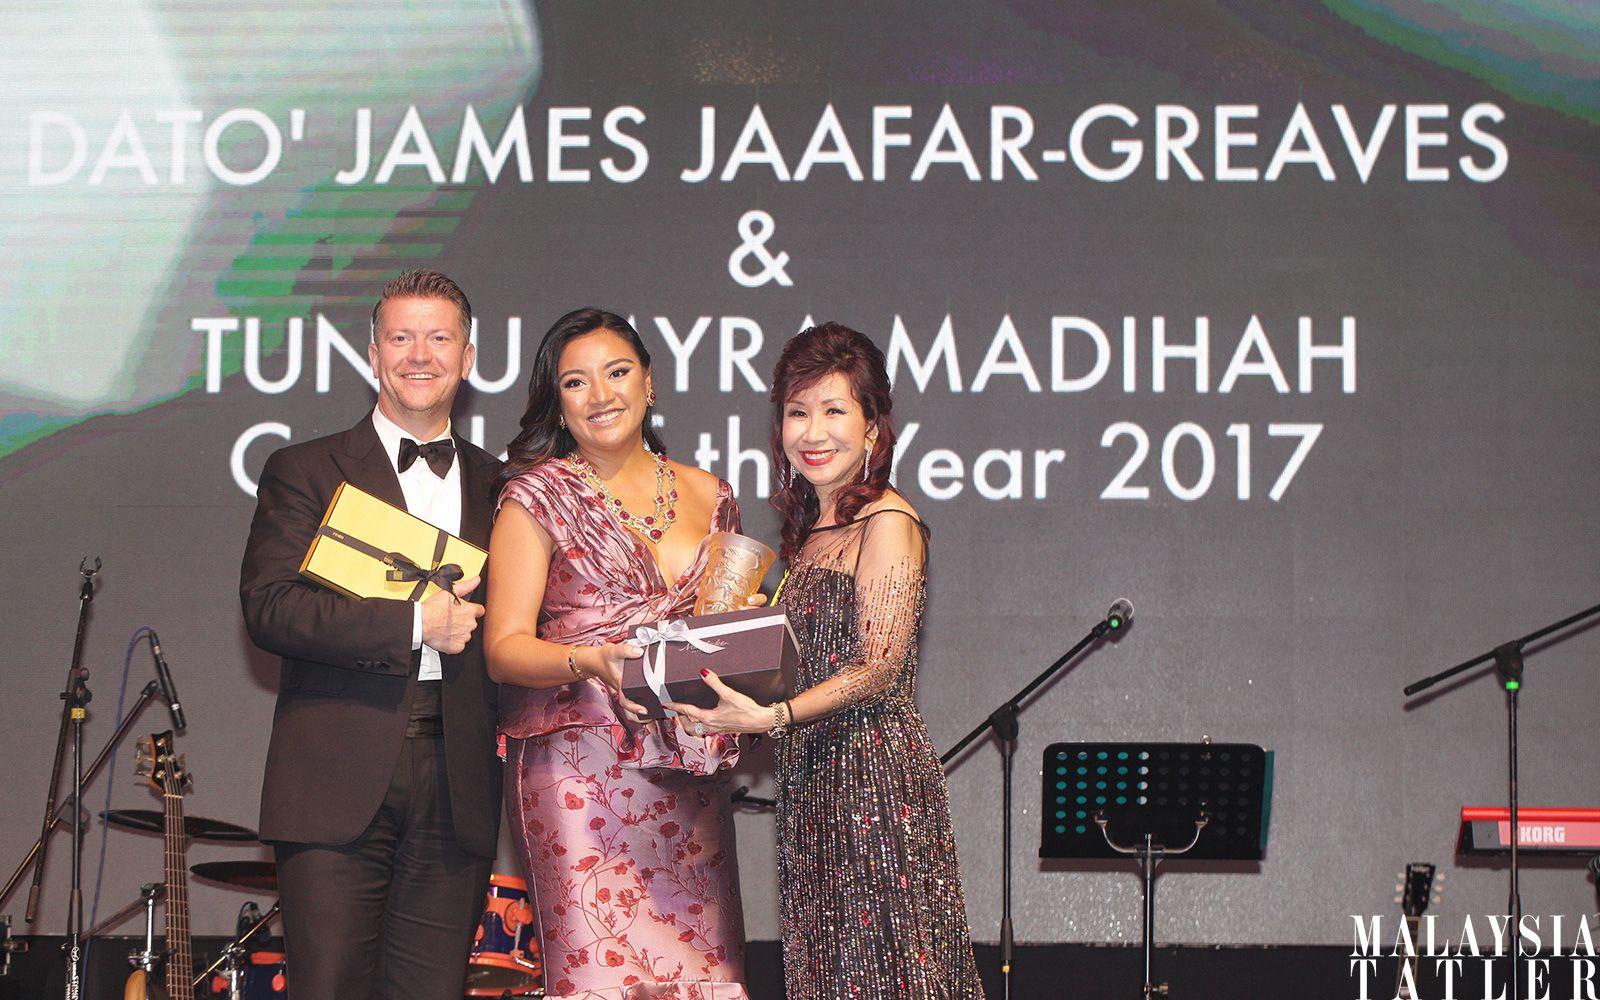 Dato' James Jaafar-Greaves and Tunku Datin Myra Madihah receiving their award